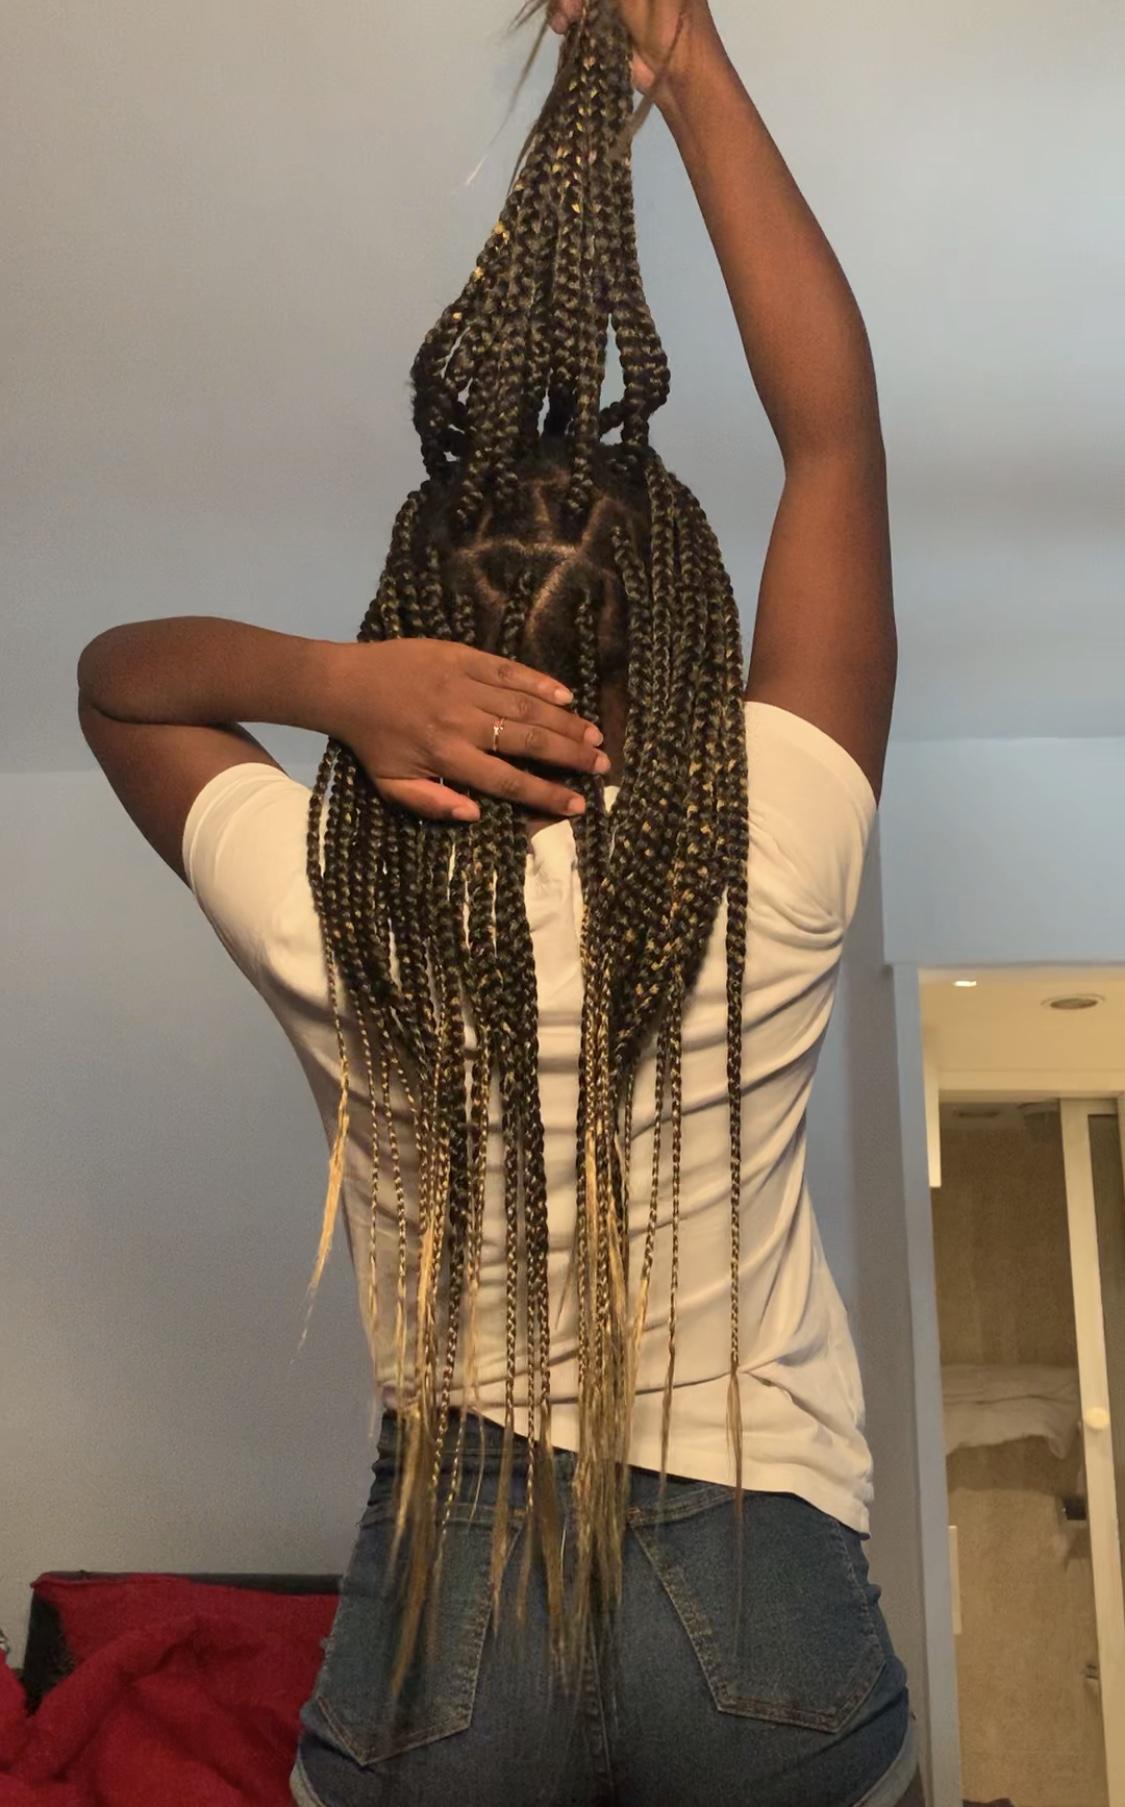 salon de coiffure afro tresse tresses box braids crochet braids vanilles tissages paris 75 77 78 91 92 93 94 95 XMQEPVJQ